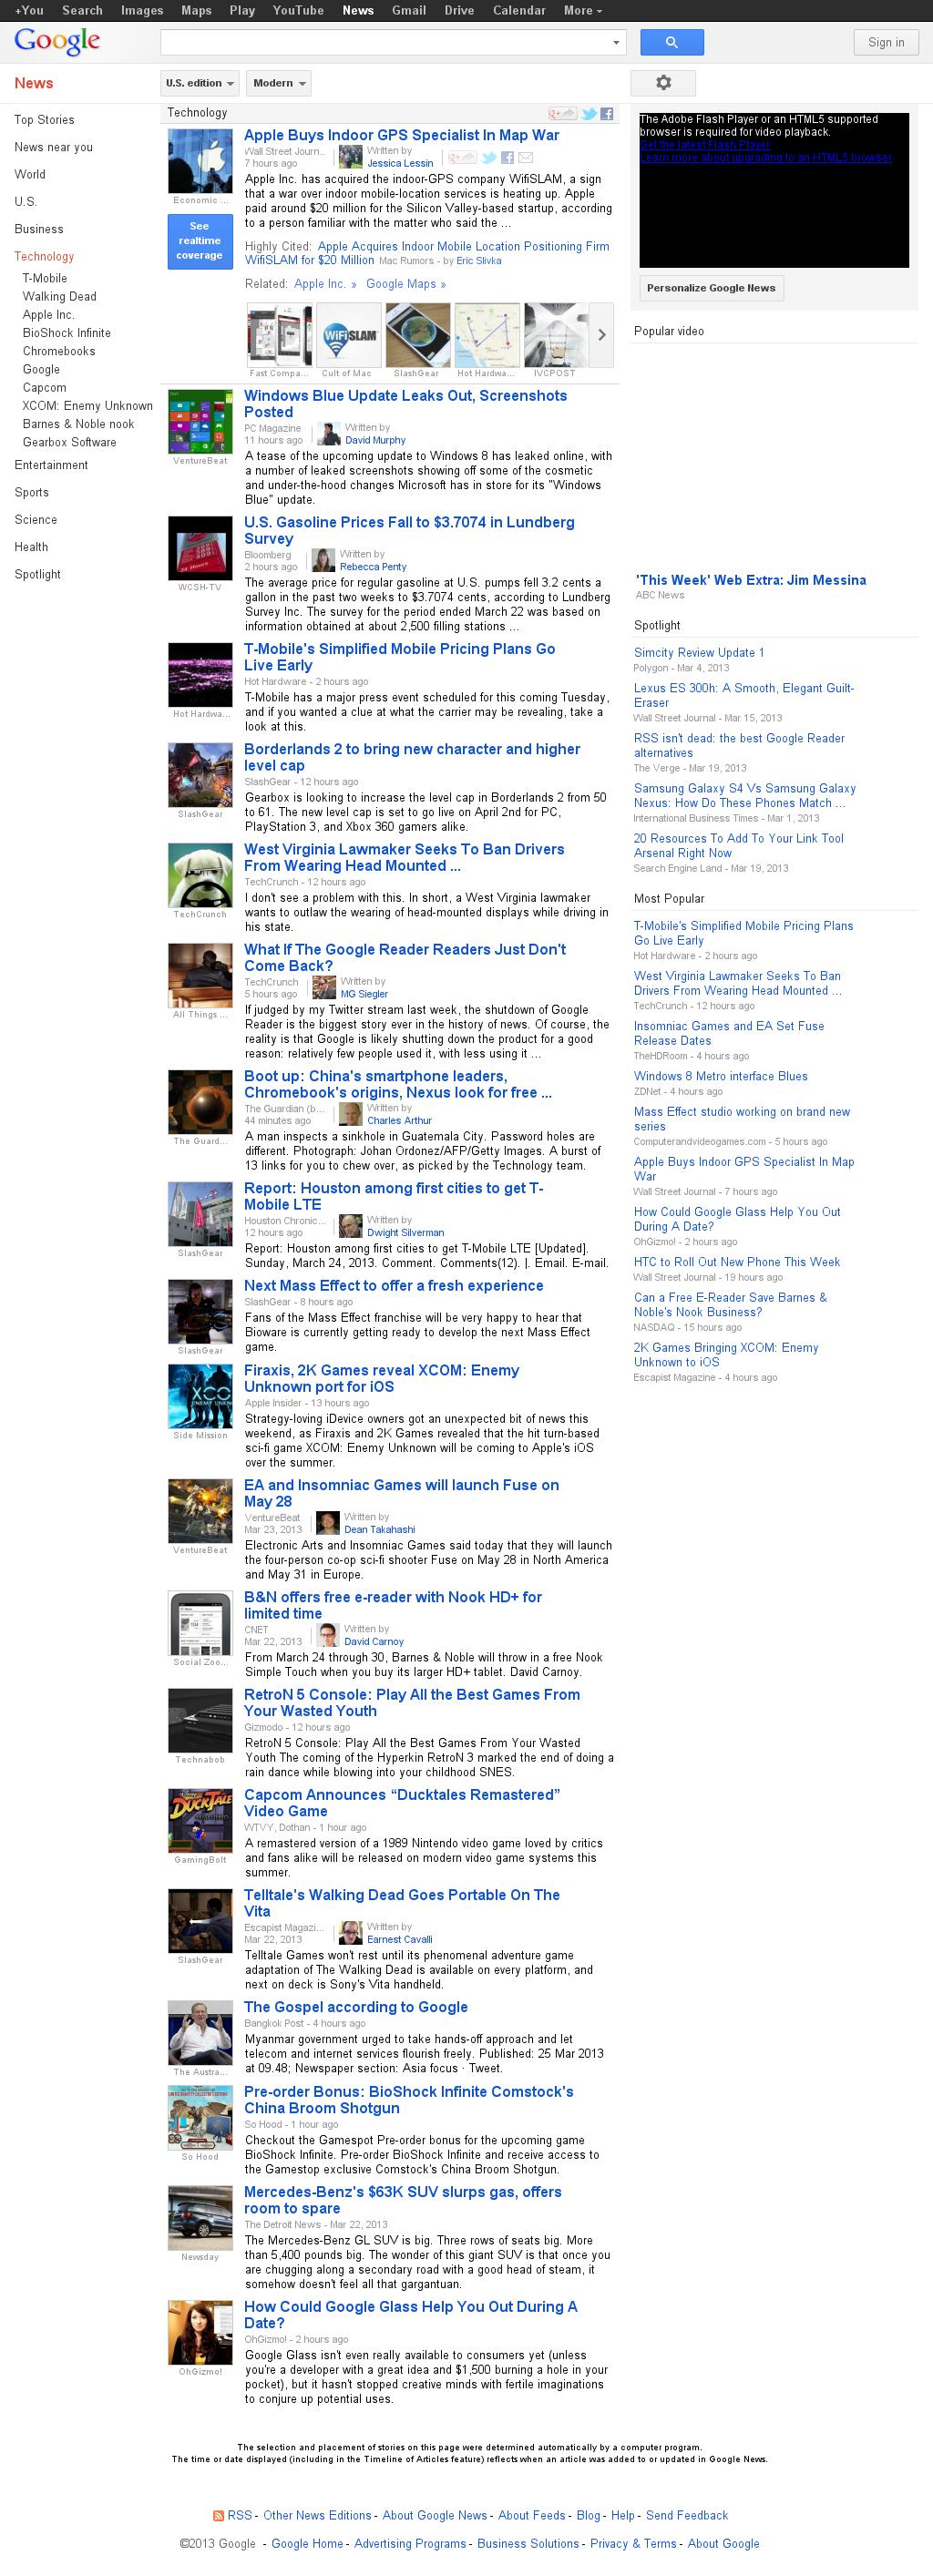 Google News: Technology at Monday March 25, 2013, 7:15 a.m. UTC